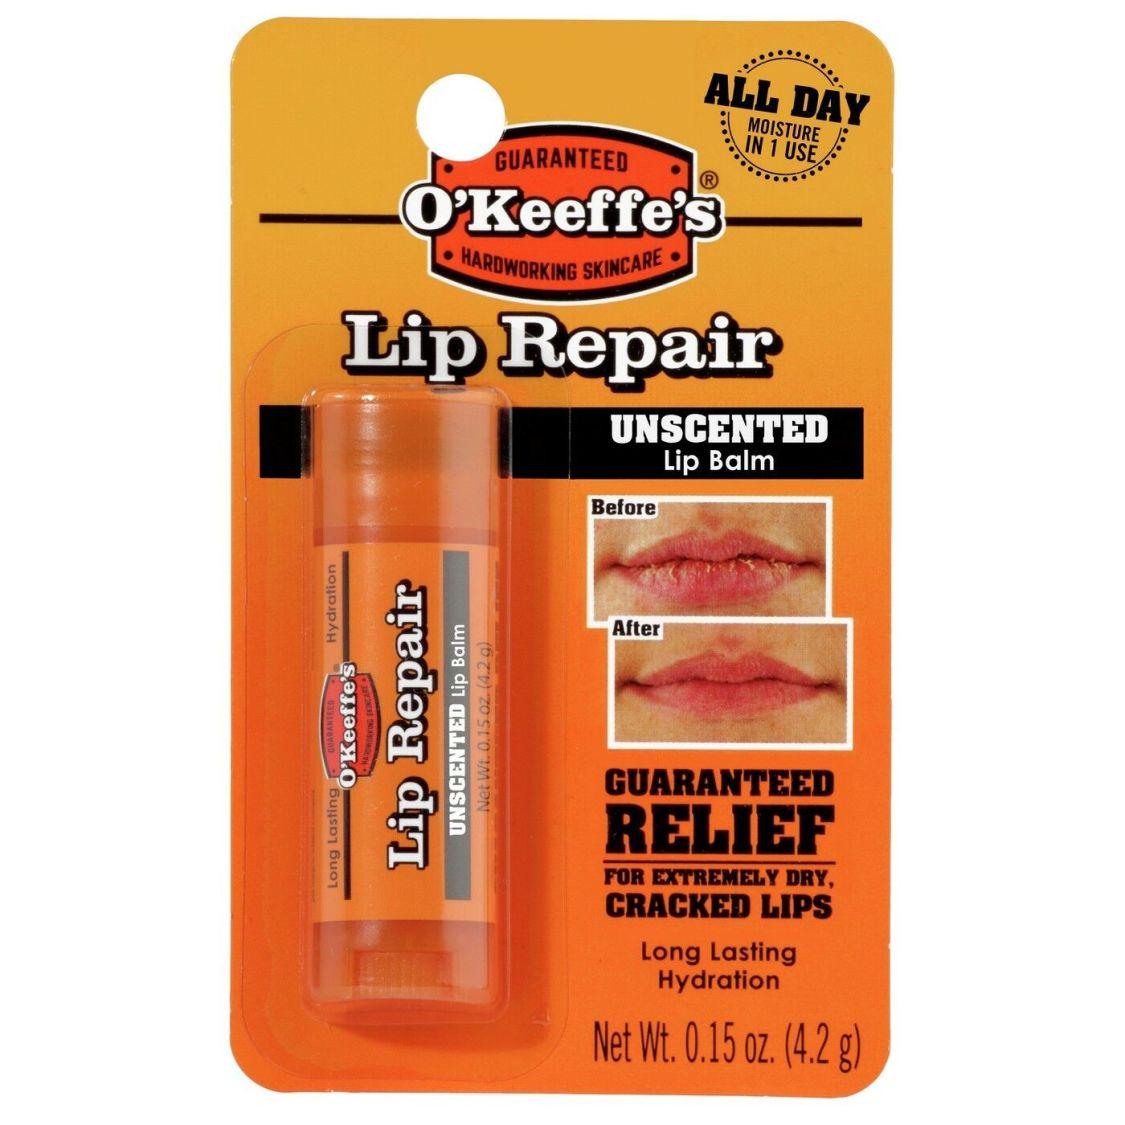 O'Keeffe's Lip Repair Balm Balsam für extrem trockene, spröde & rissige Lippen